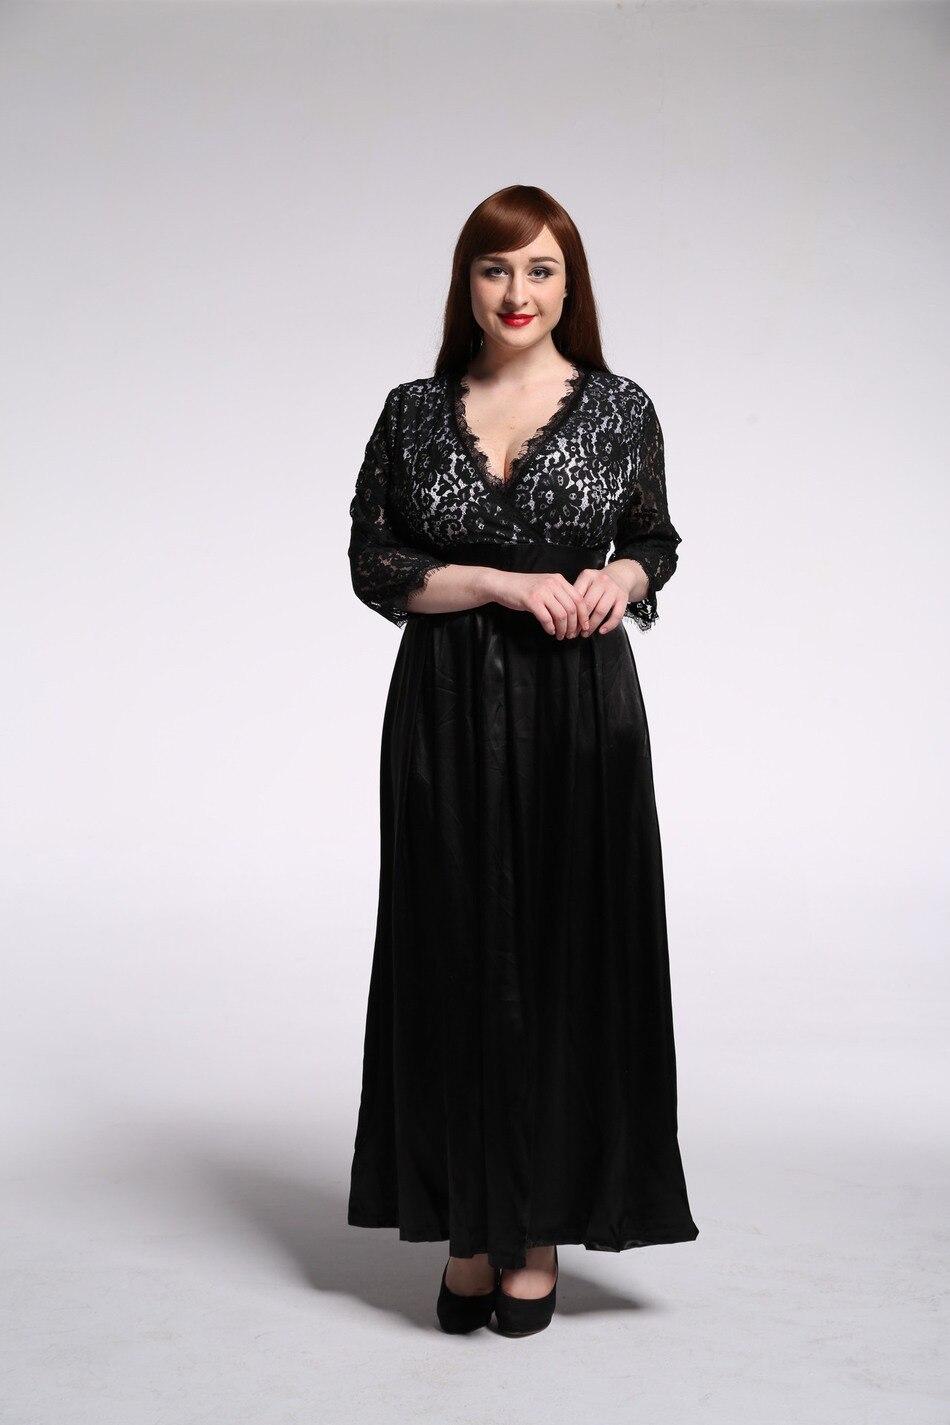 f721809a7d134 Clobee 2017 Womens Elegant Lace Party Dress Big Sizes Tunic Sexy Black Maxi  Long Dresses Plus Size 5XL 6XL 7XL vestidos de festa-in Dresses from Women s  ...